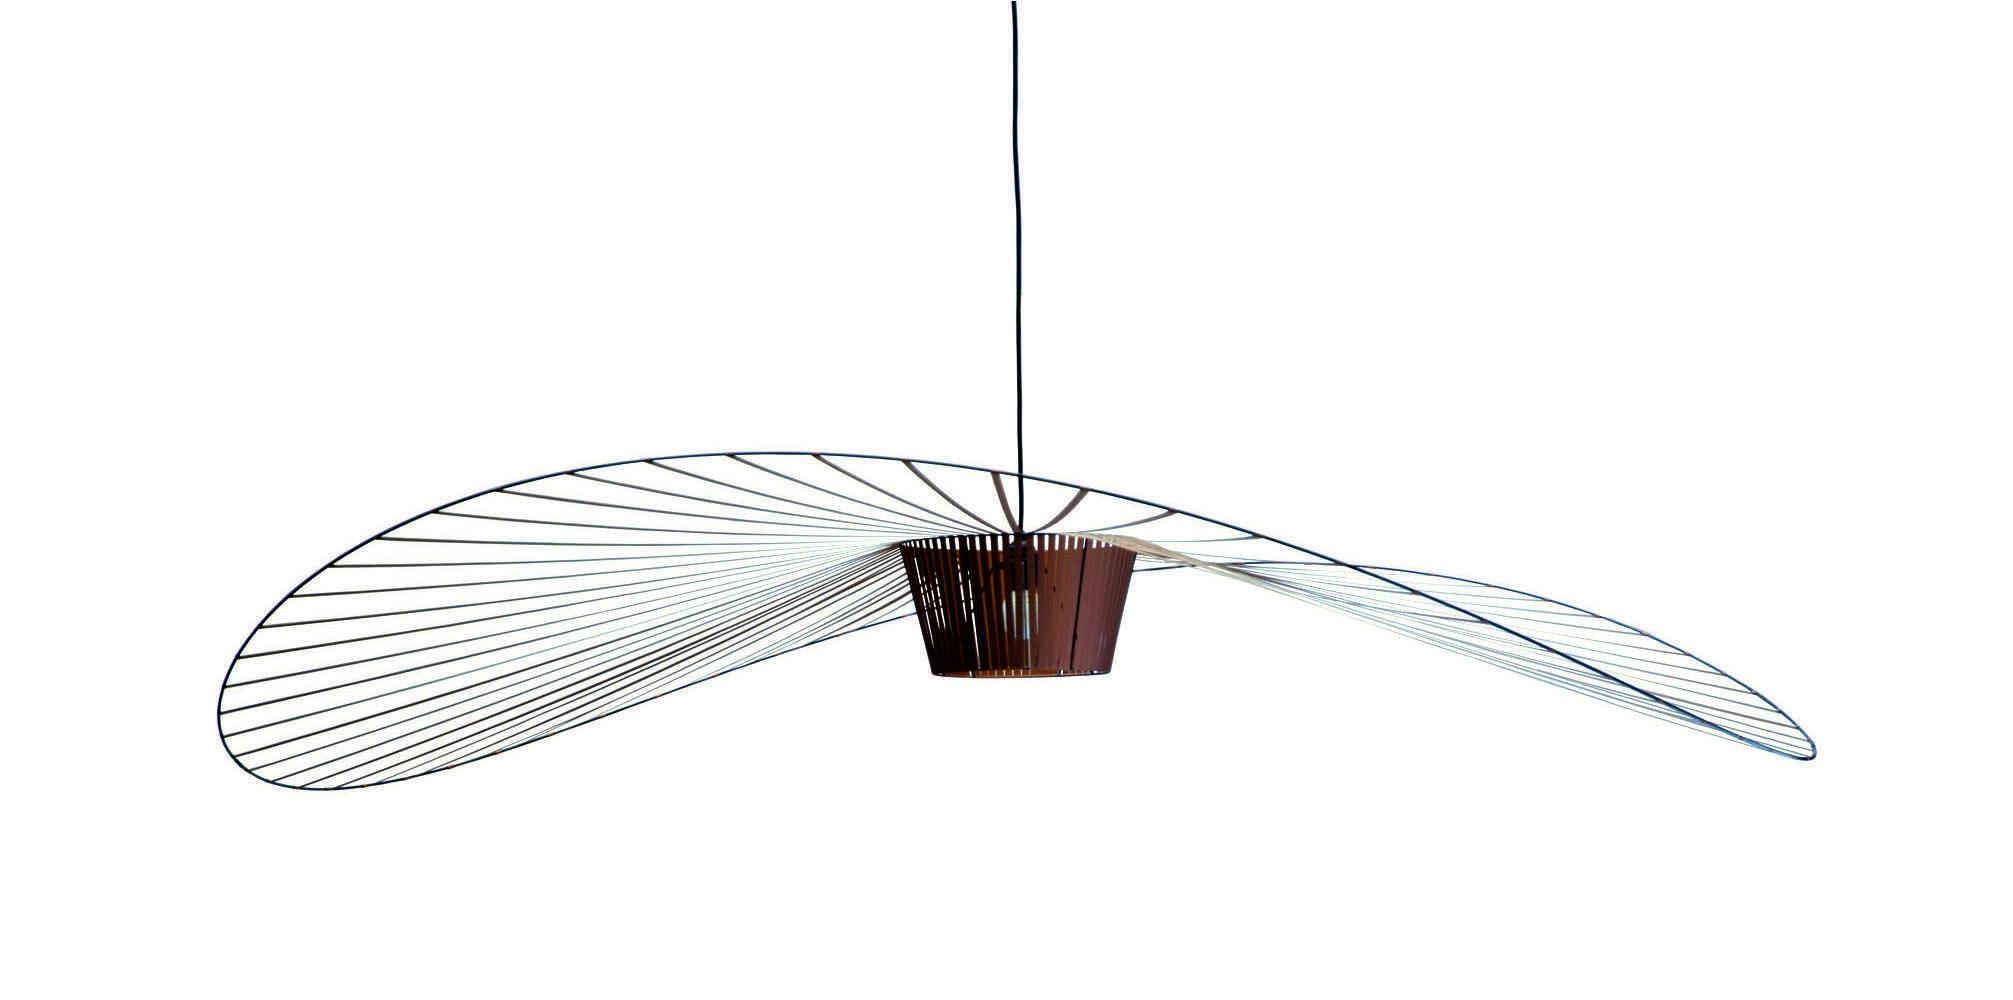 Luminaire - Suspensions - Suspension Vertigo Small / Ø 140 cm - Petite Friture - Cuivre - Fibre de verre, Polyuréthane